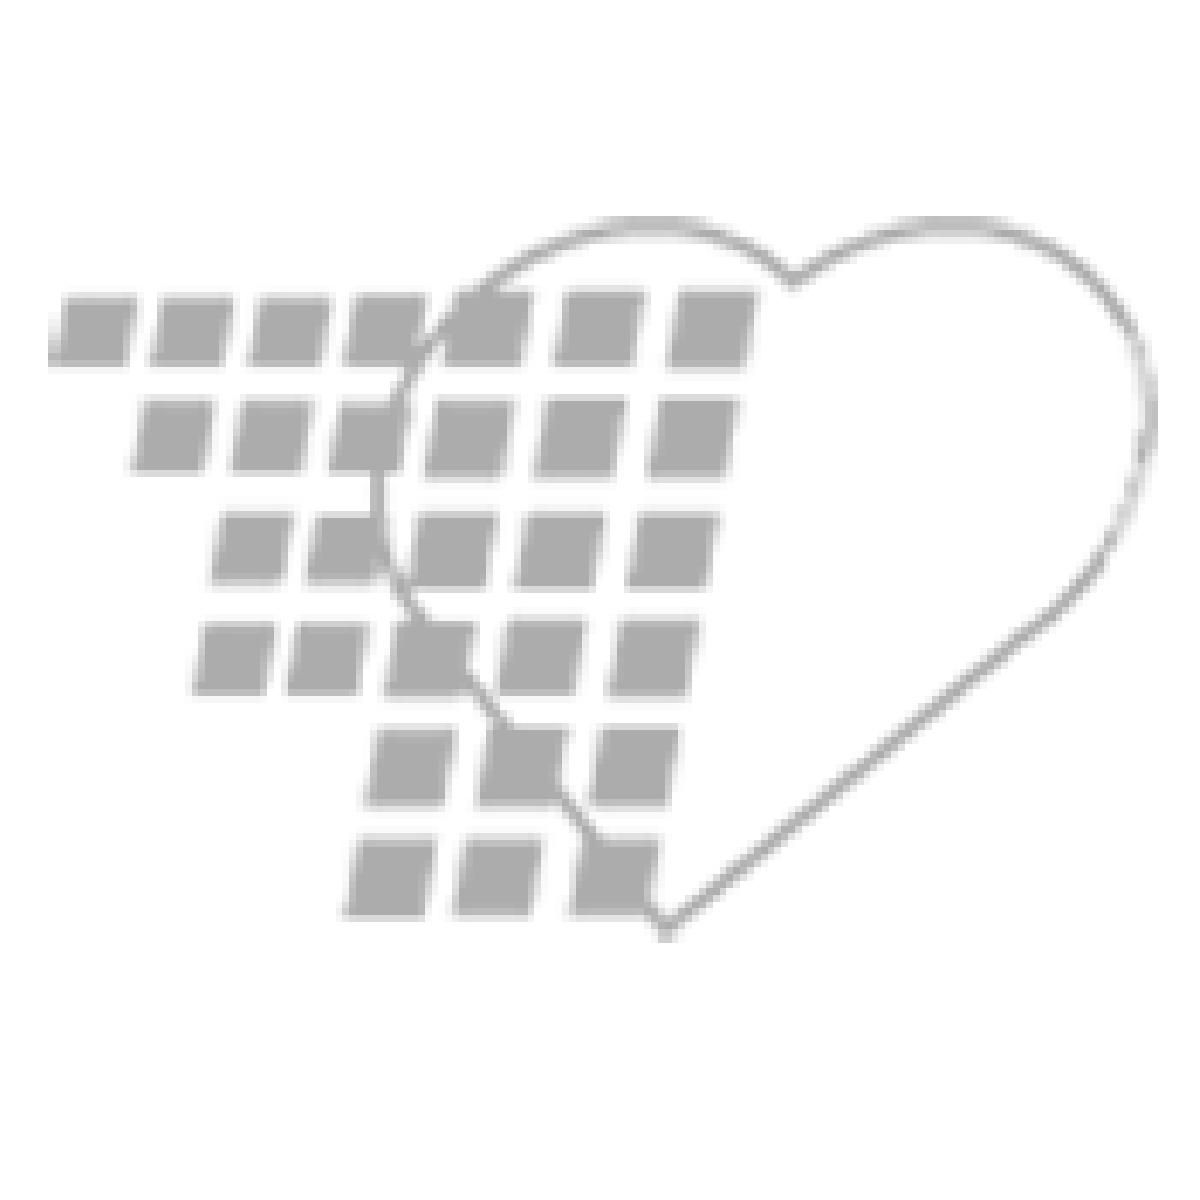 06-93-9024 - Demo Dose® Influenza Virus Vaccine 5 mL vial